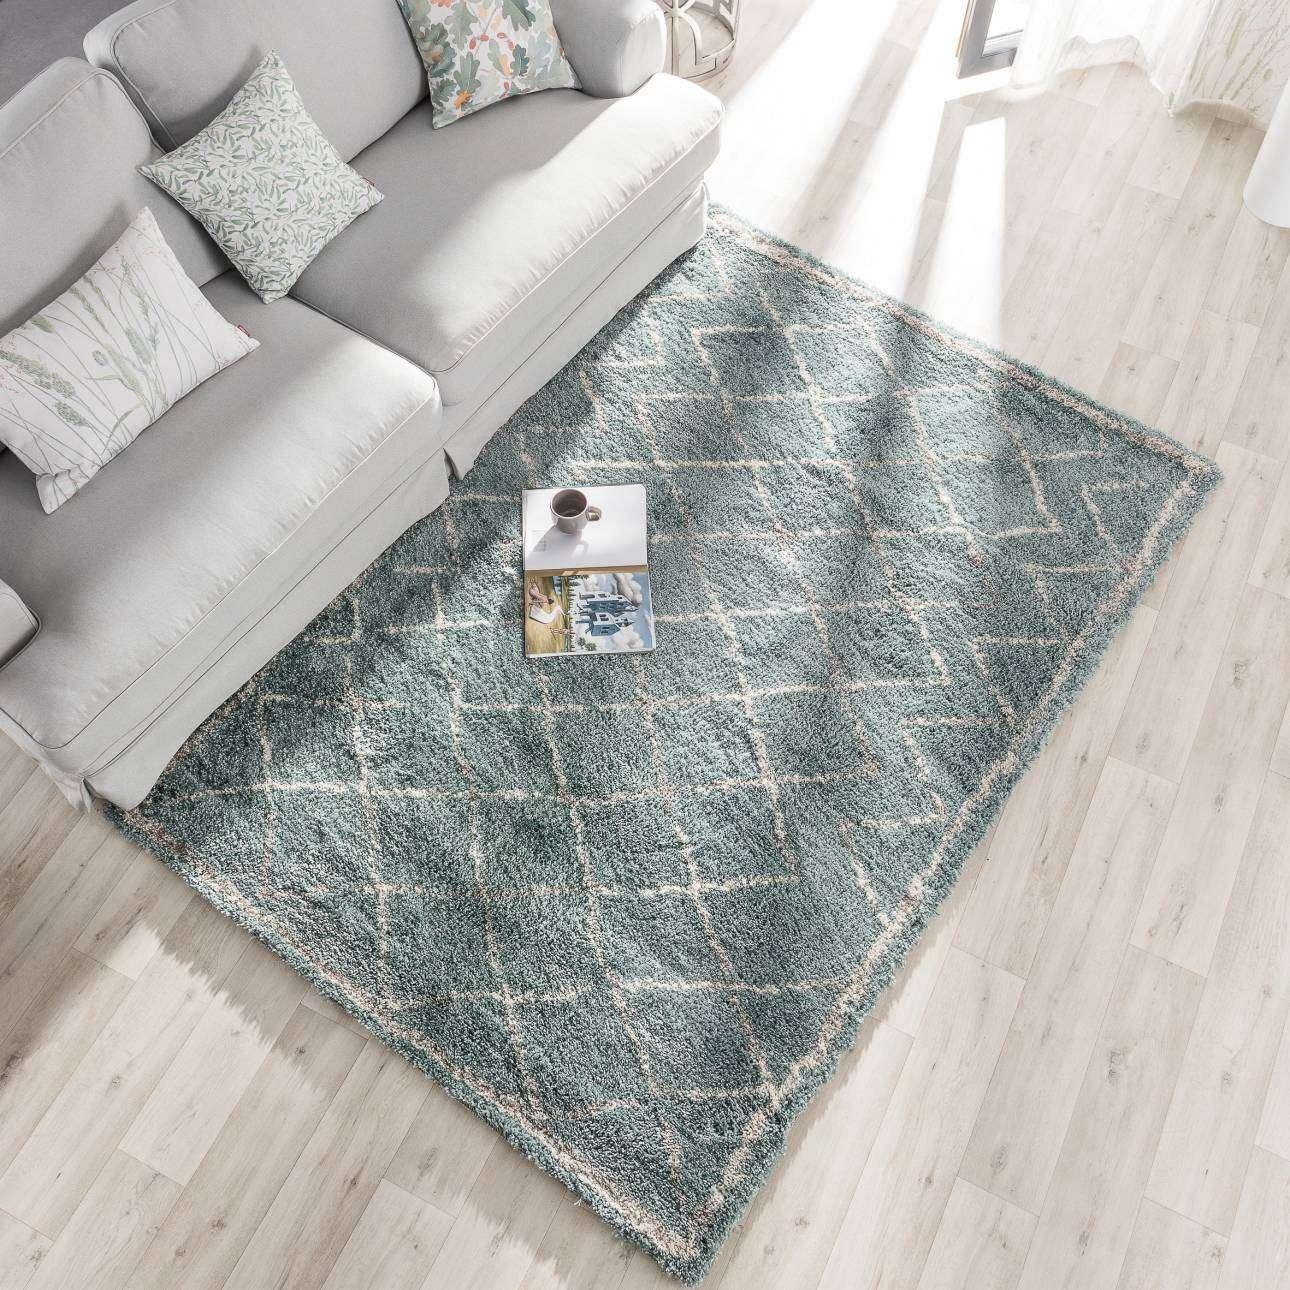 Teppich Royal Teal Blue 160x230cm